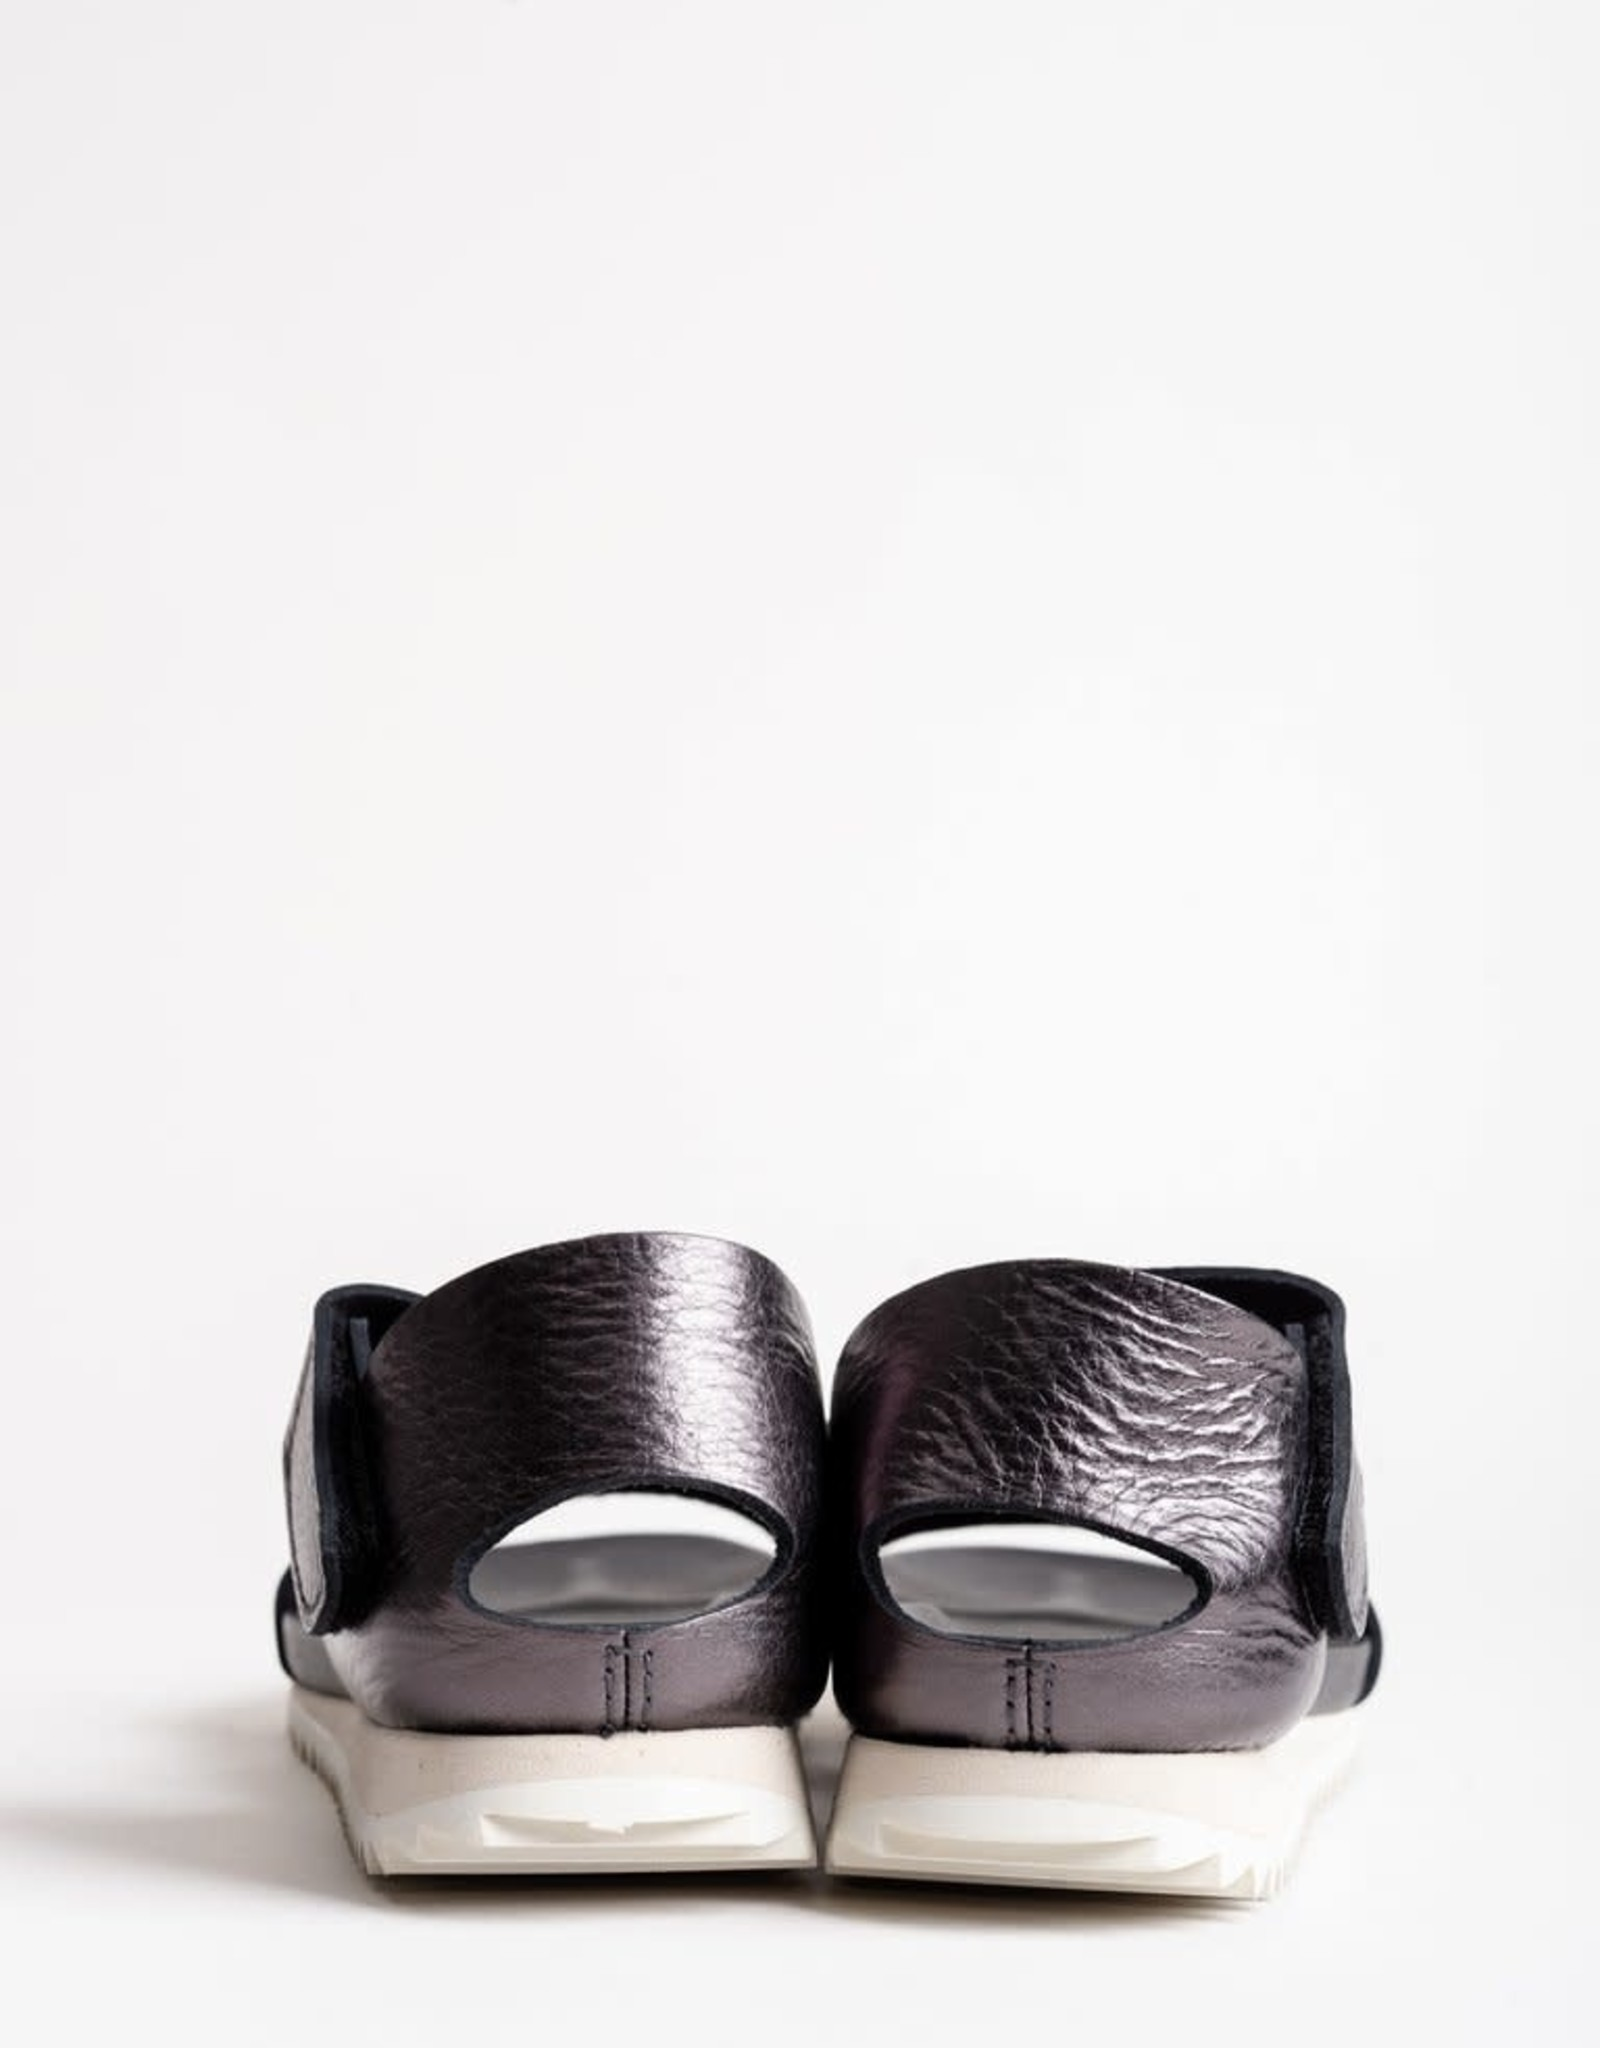 PEDRO GARCIA - Jedda Sandal